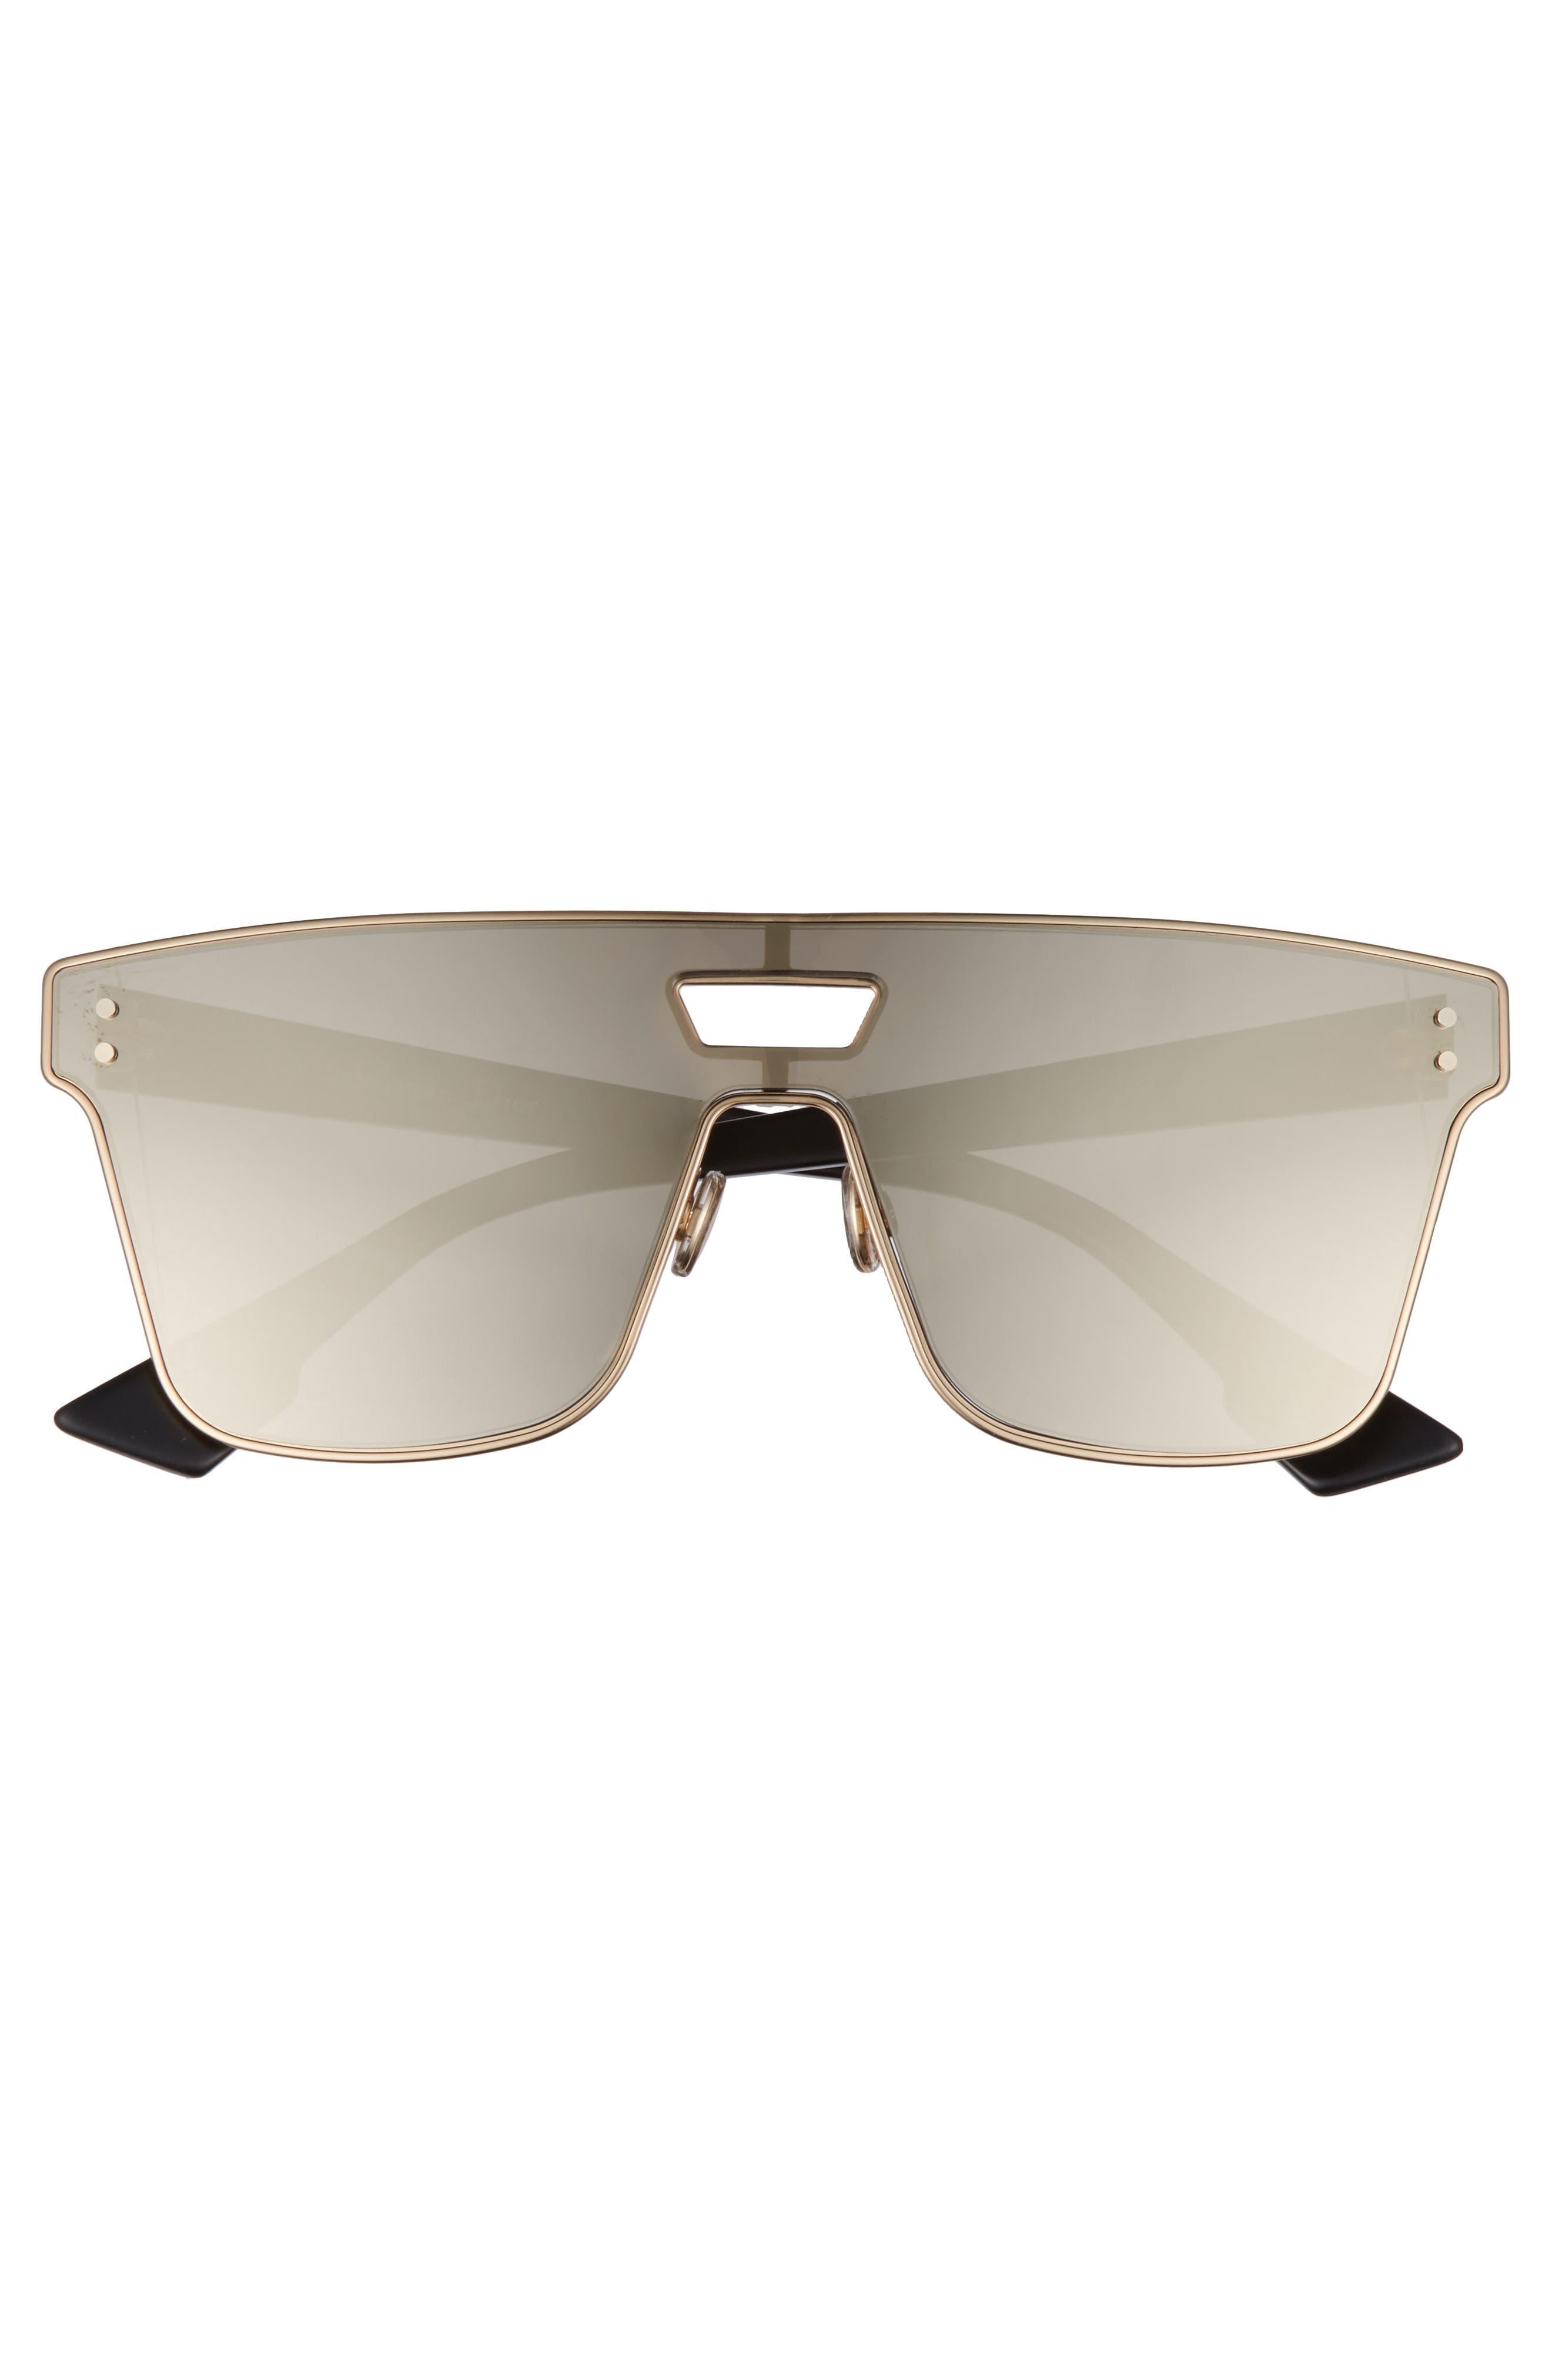 Shield Sunglasses,                             Alternate thumbnail 3, color,                             001